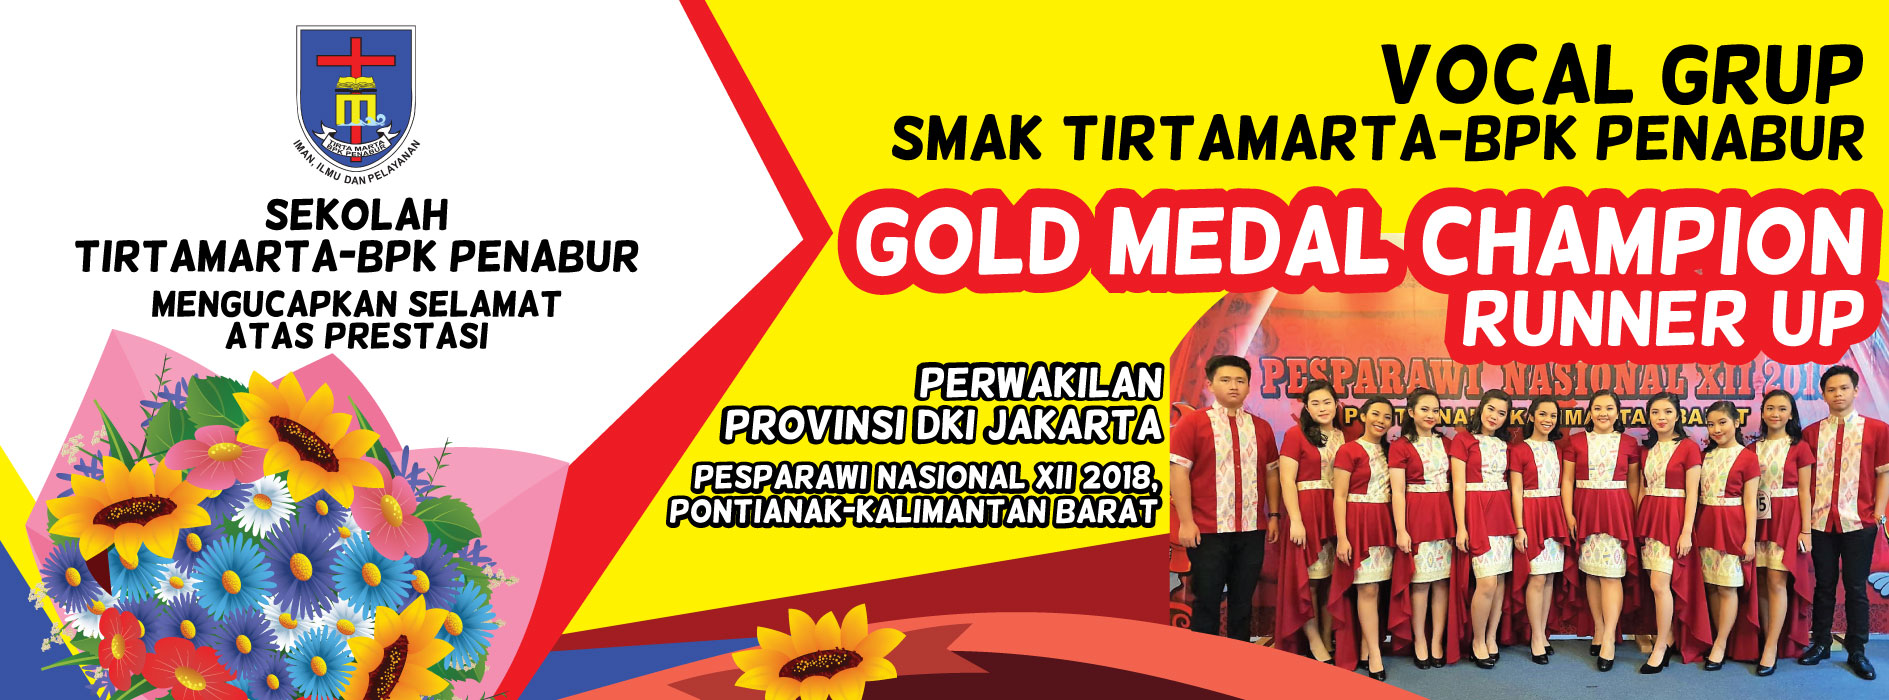 gold medal vocal grup smak tirtamarta bpk penabur jakarta pondok indah cinere pesparawi nasional xii 2018 pontianak kalimantan barat runner up